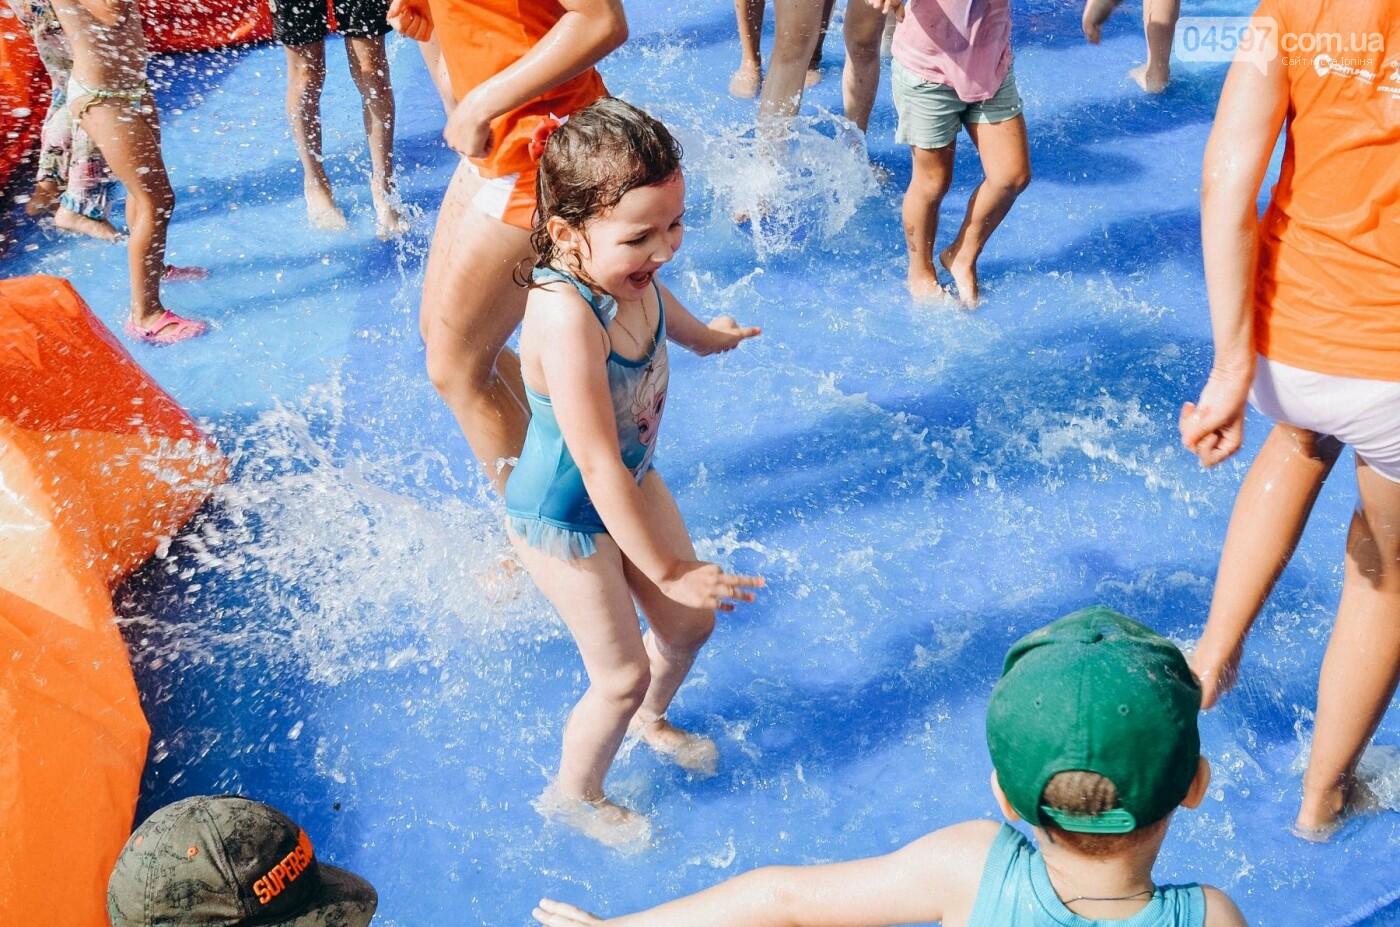 Summer party від Сontinent: як це було, фото-16